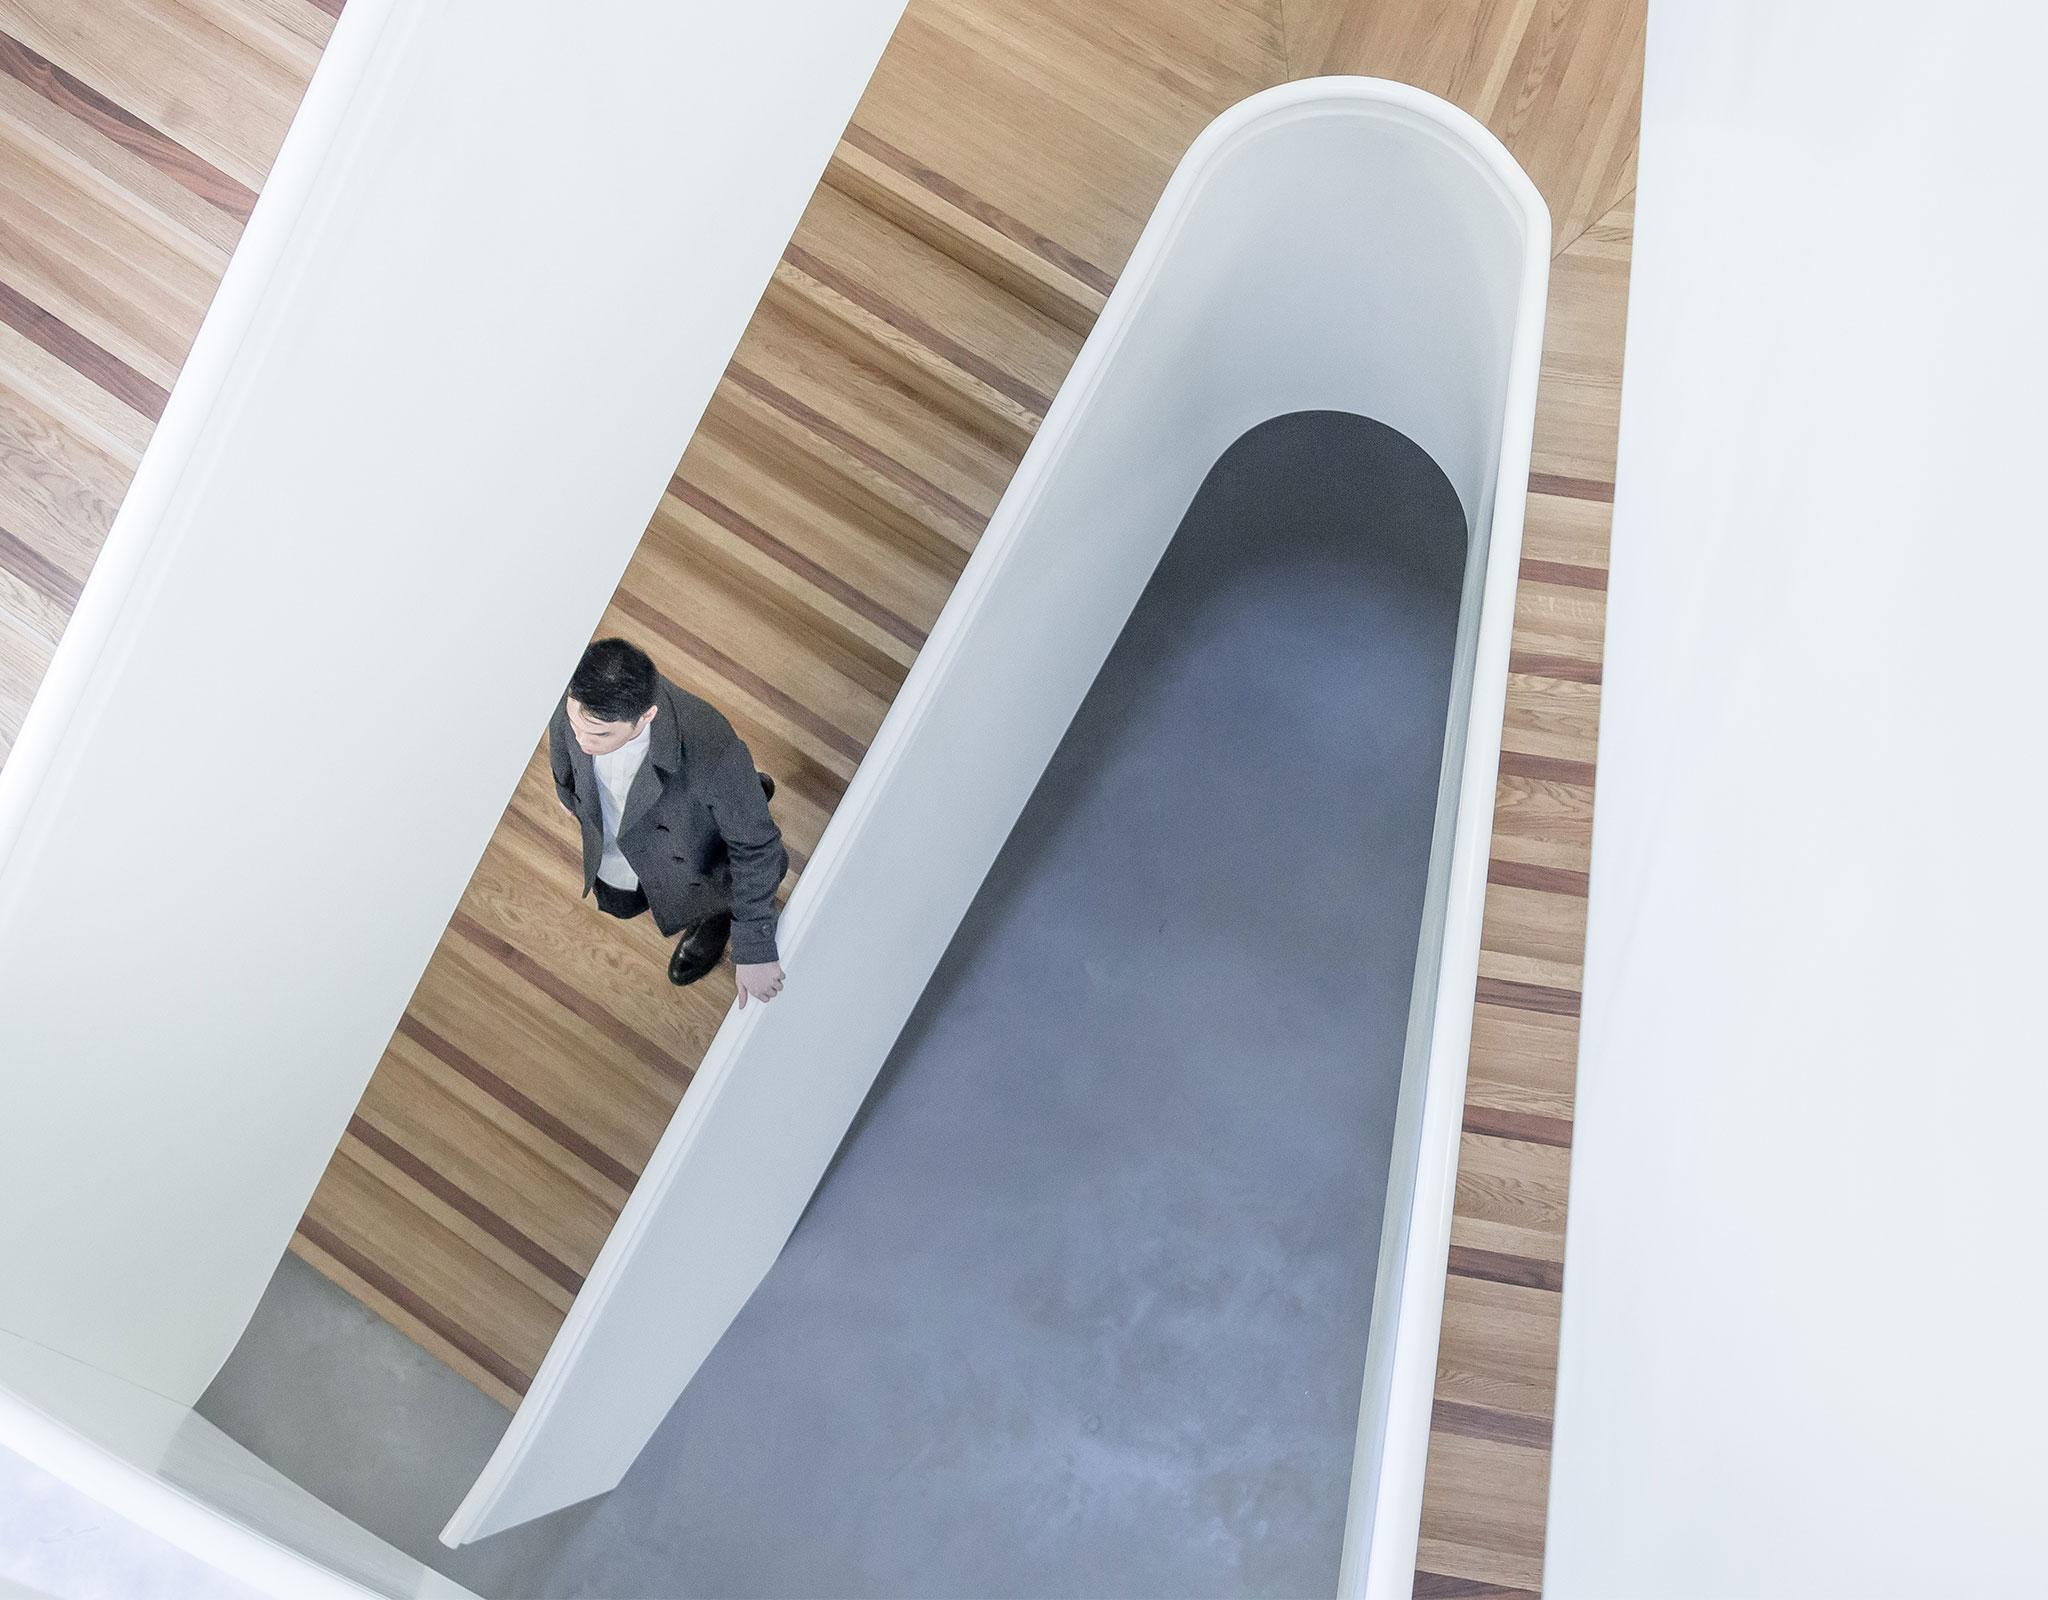 Man walking on stairs in modern building